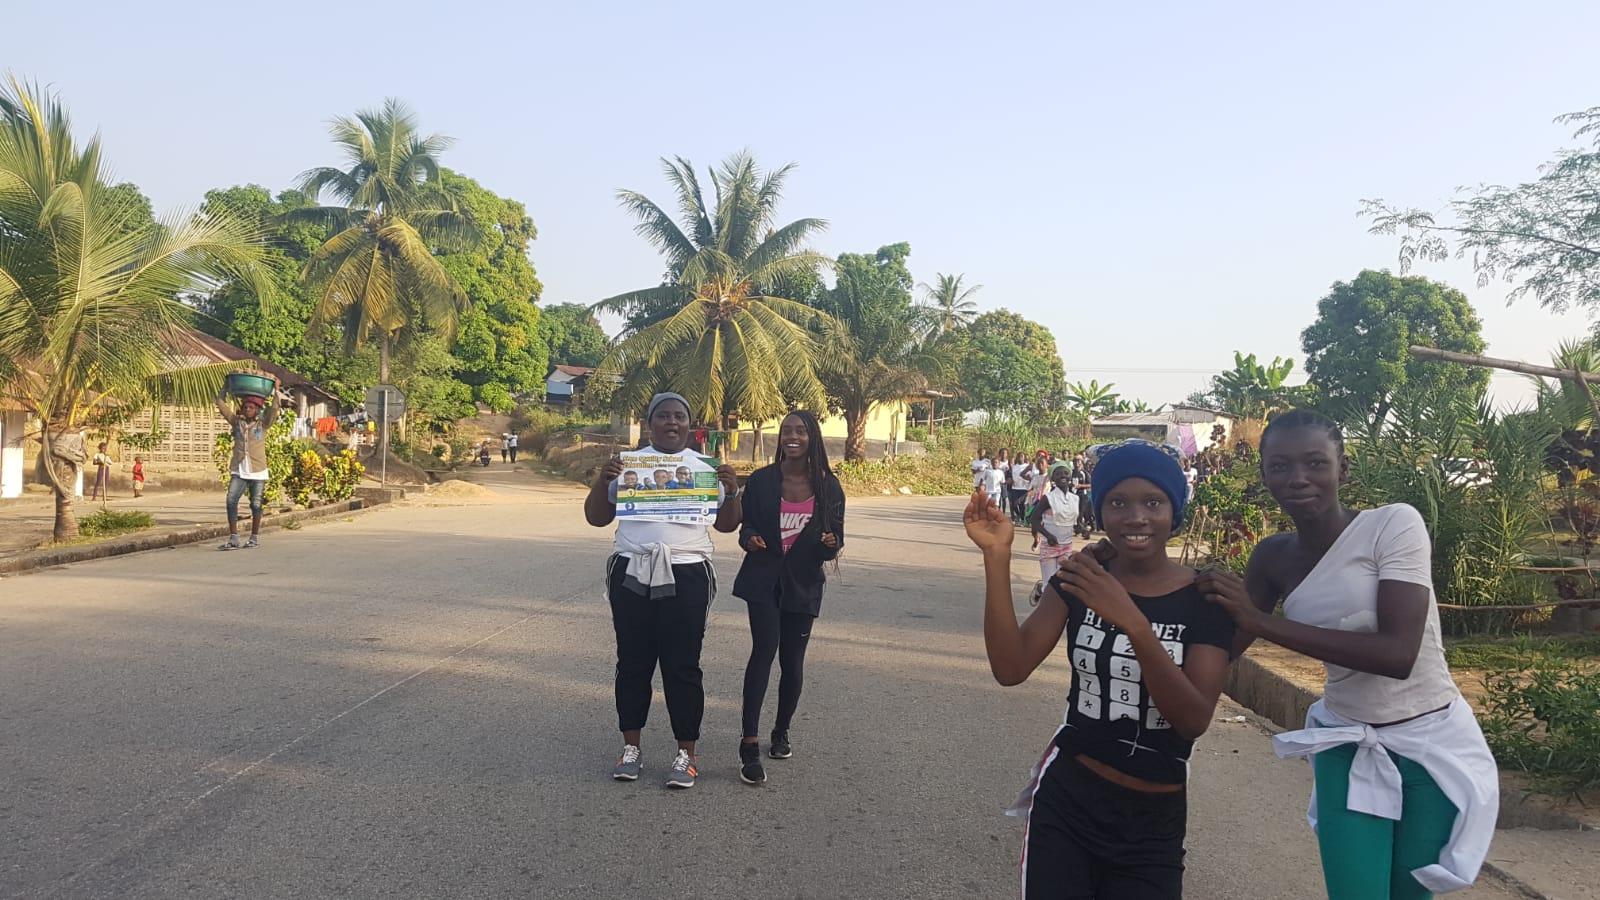 Sierra_Leone_Nia_Sullivan_MISSION_STATEMENT_PHOTO2.jpeg